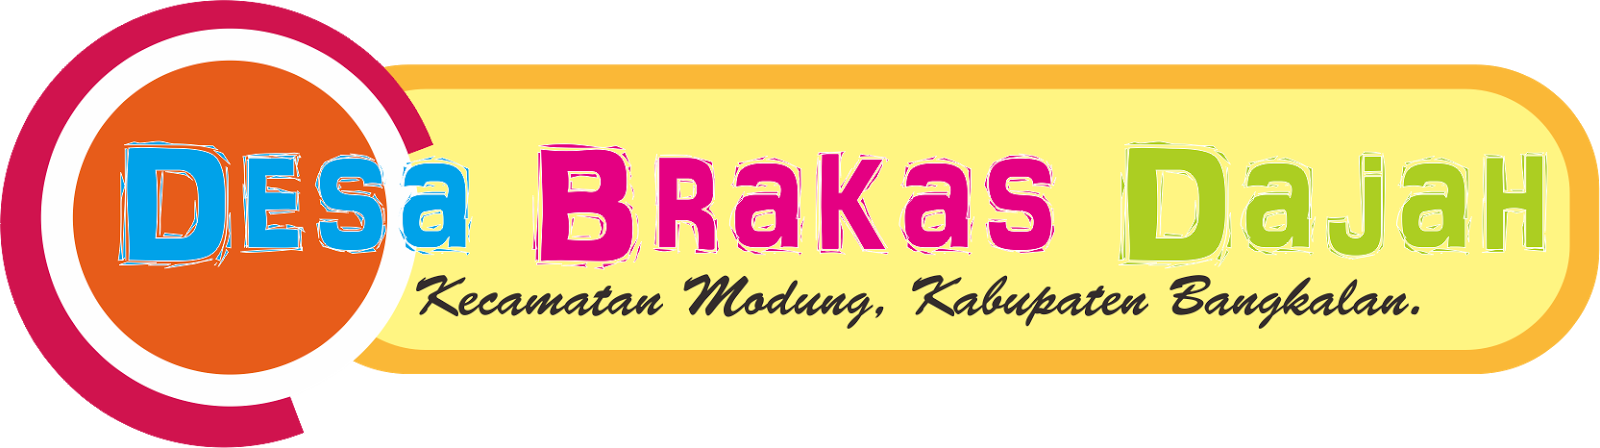 Brakas Dajah